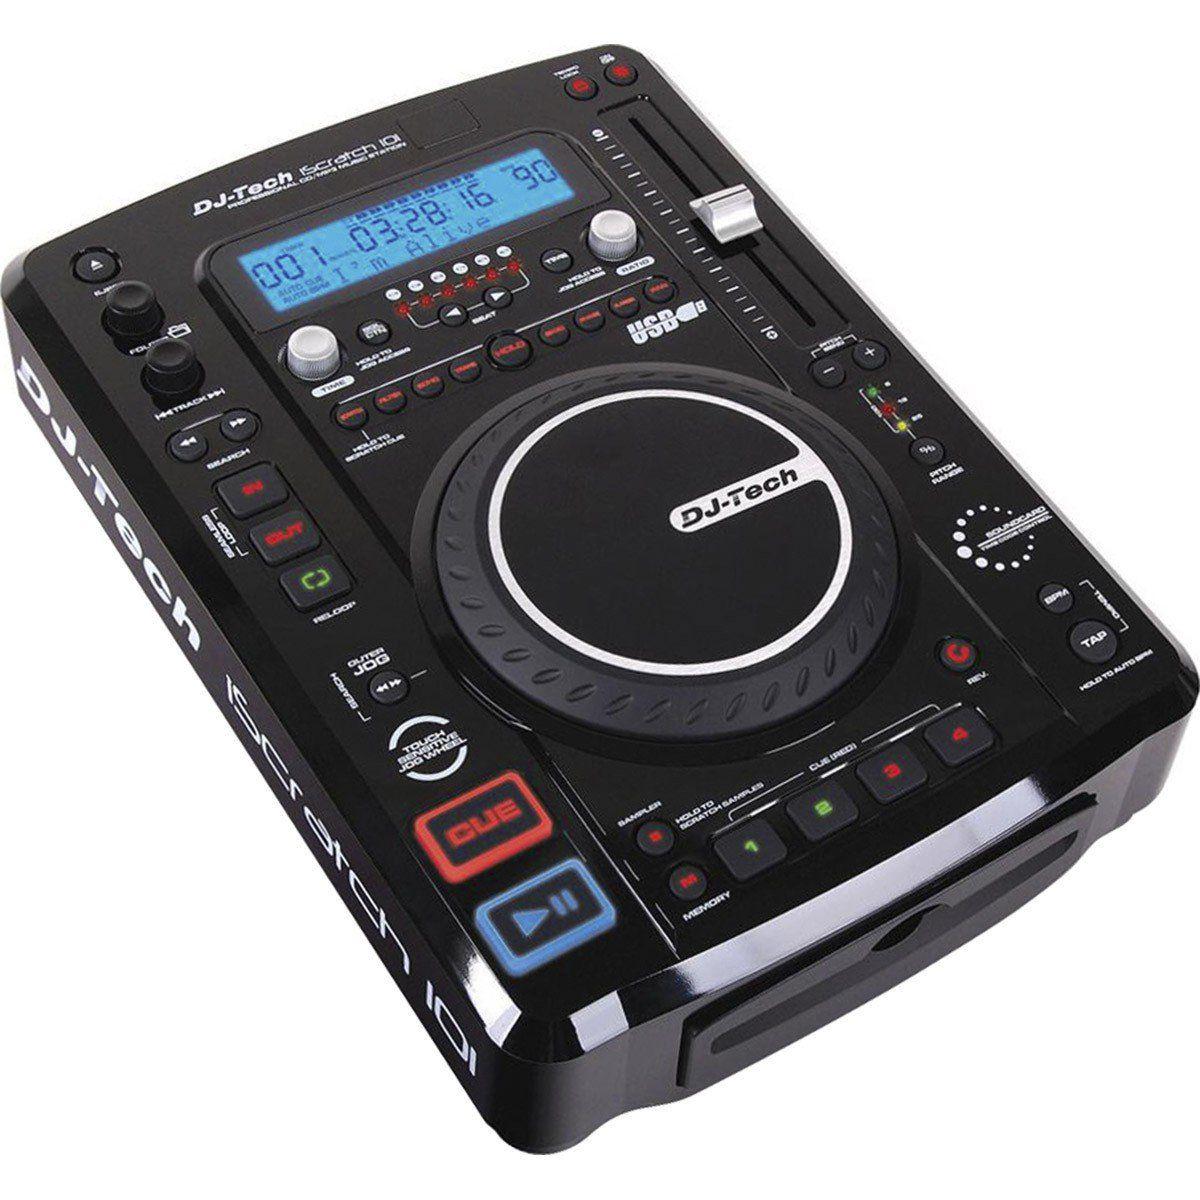 Dj-Tech iScratch 101 V2 Player USB MP3 Dj-Tech iScratch 101V2 para DJ Profissional